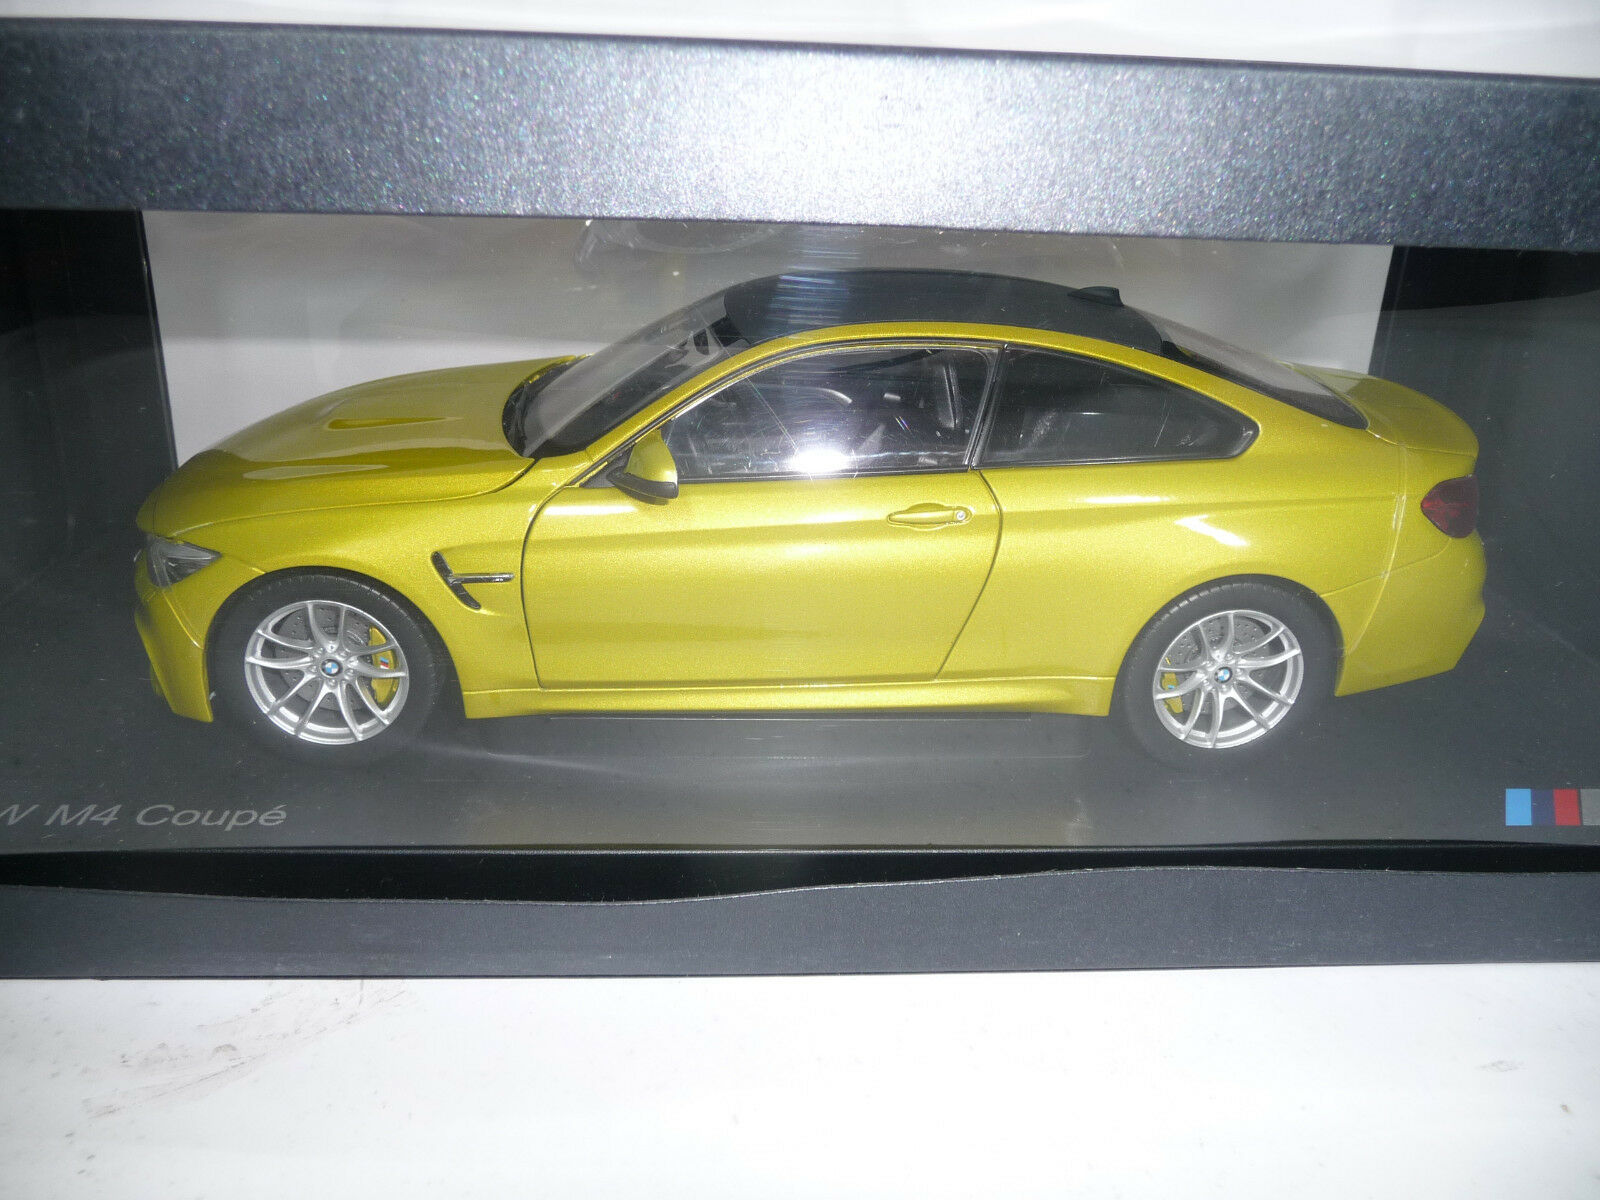 online al mejor precio Bmw m4 f82 Coupe Austin amarillo metalizado 1 18 18 18 Paragon dealer very rare  contador genuino